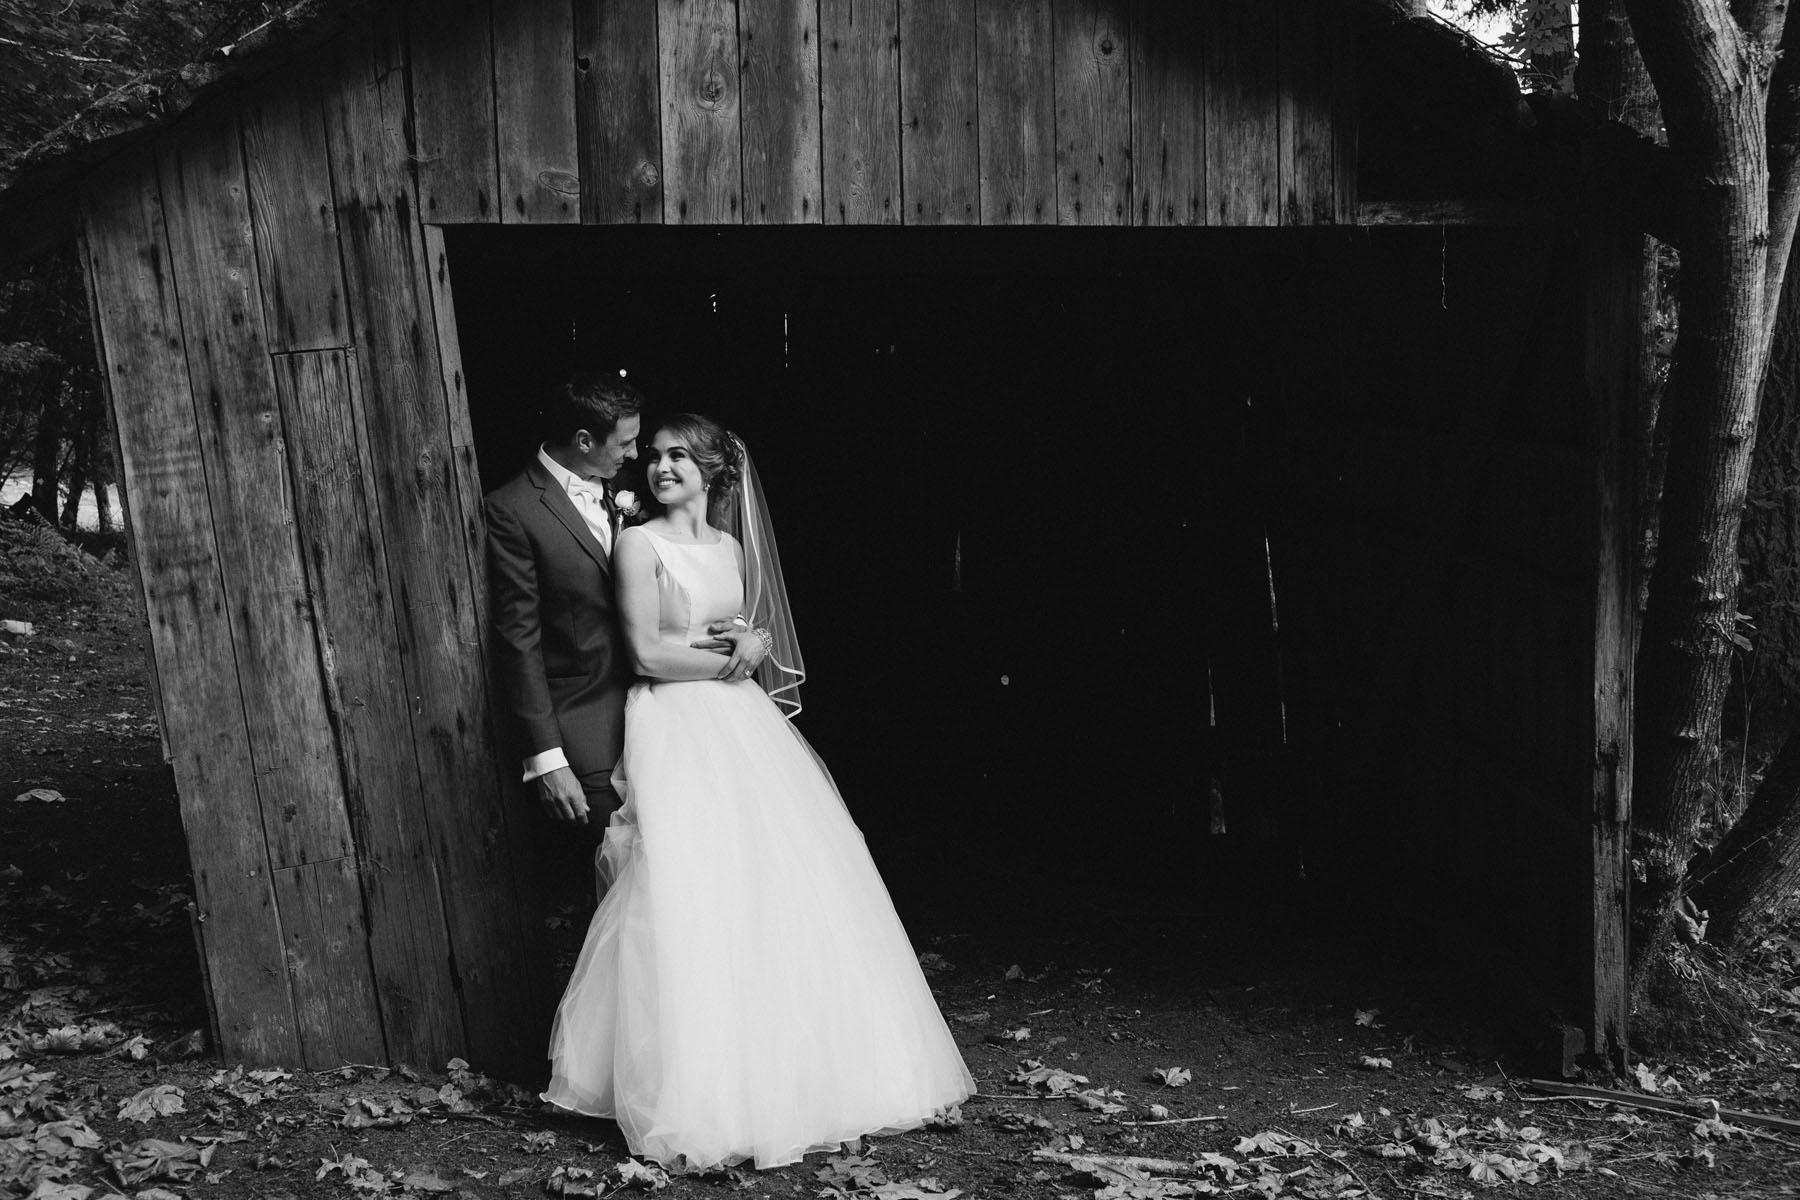 thetis-island-wedding-photographer-rp-rn-111.jpg